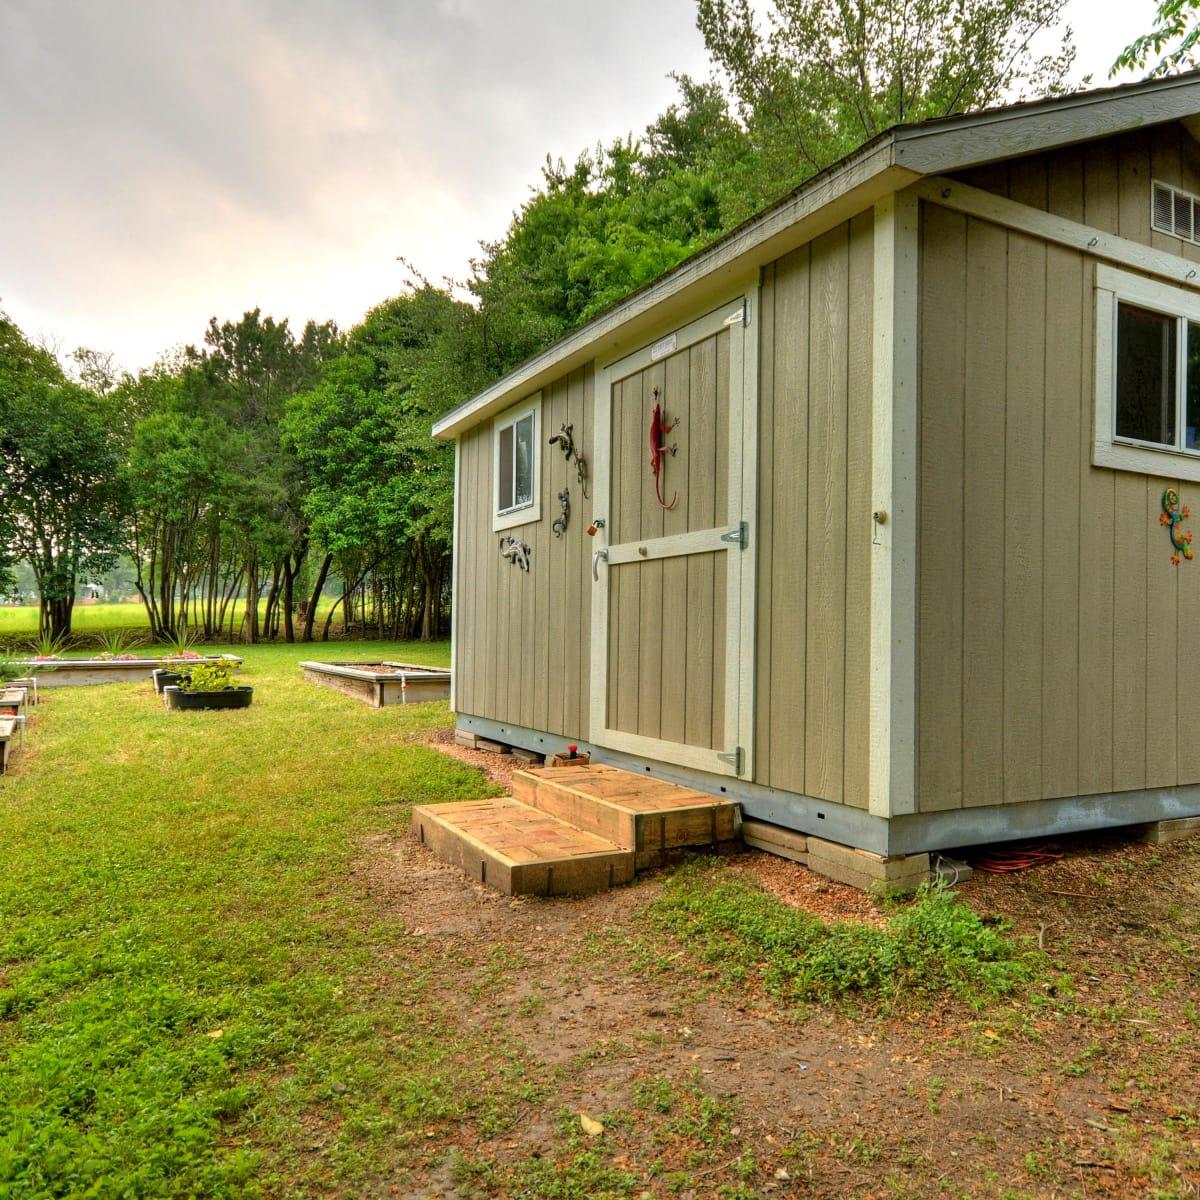 Austin home house 2416 S 2nd Street 78704 backyard storage